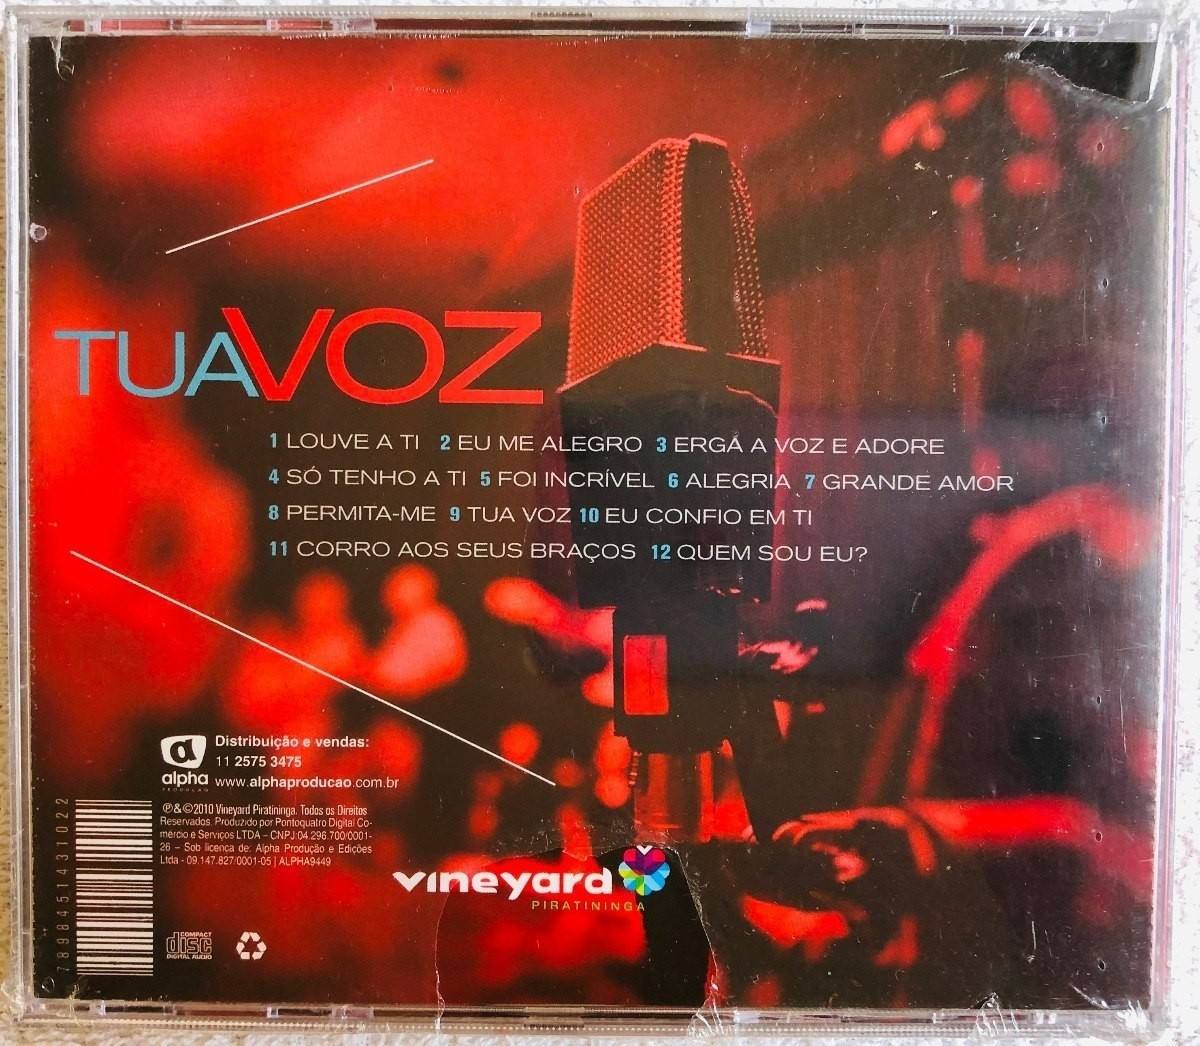 CD Vineyard - Tua Voz